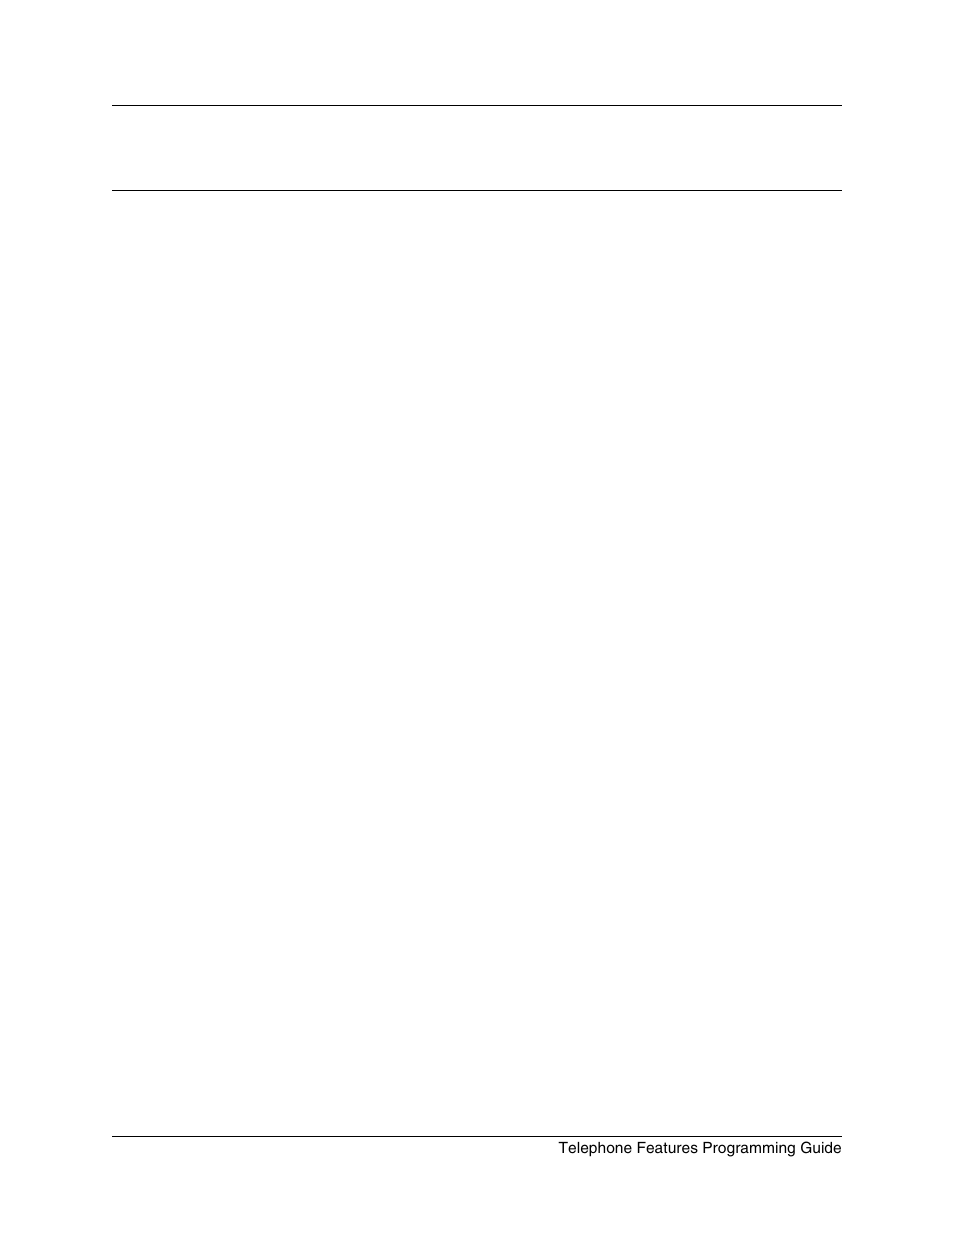 Chapter 12, Hunt groups, Chapter 12 hunt groups | Nortel